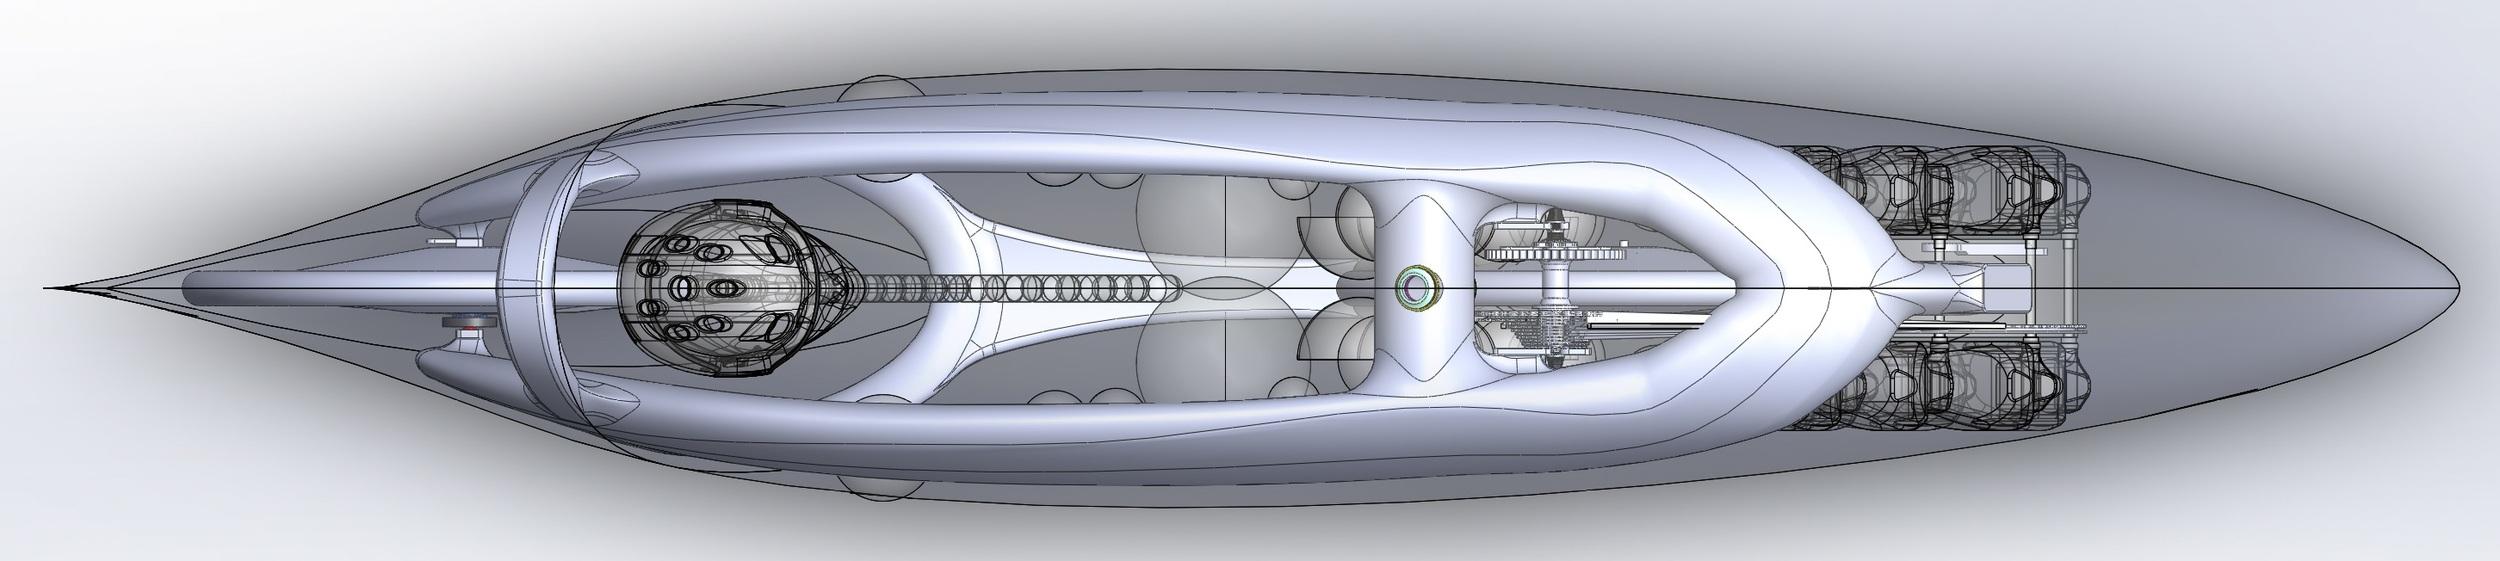 Top view of the final shape of Eta.